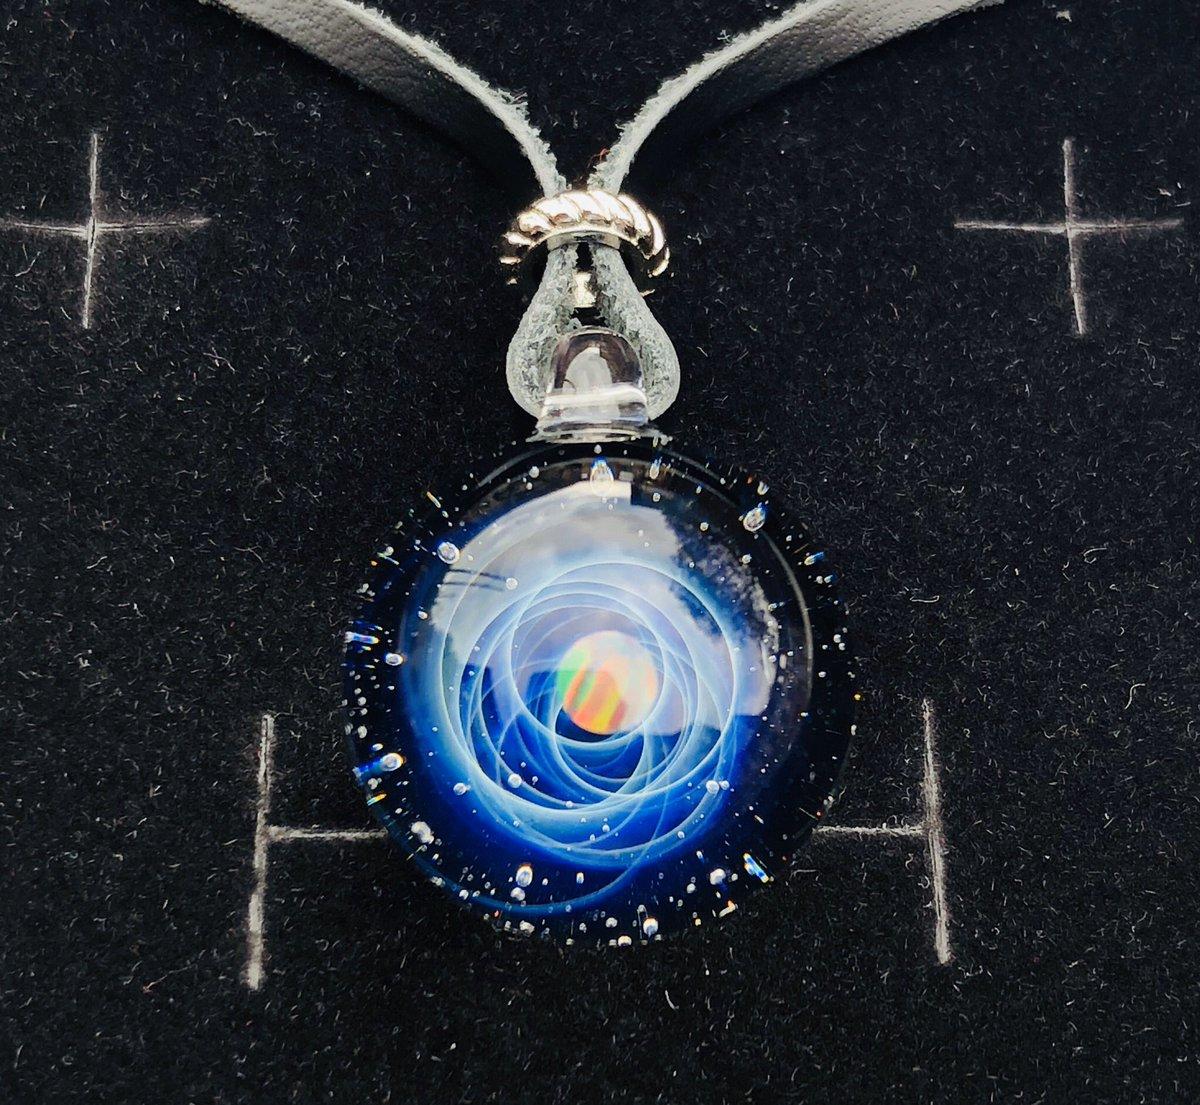 #宇宙ガラス #遊星商會 #星鏡箋 #spaceglass pic.twitter.com/aaFXZW6Uz7